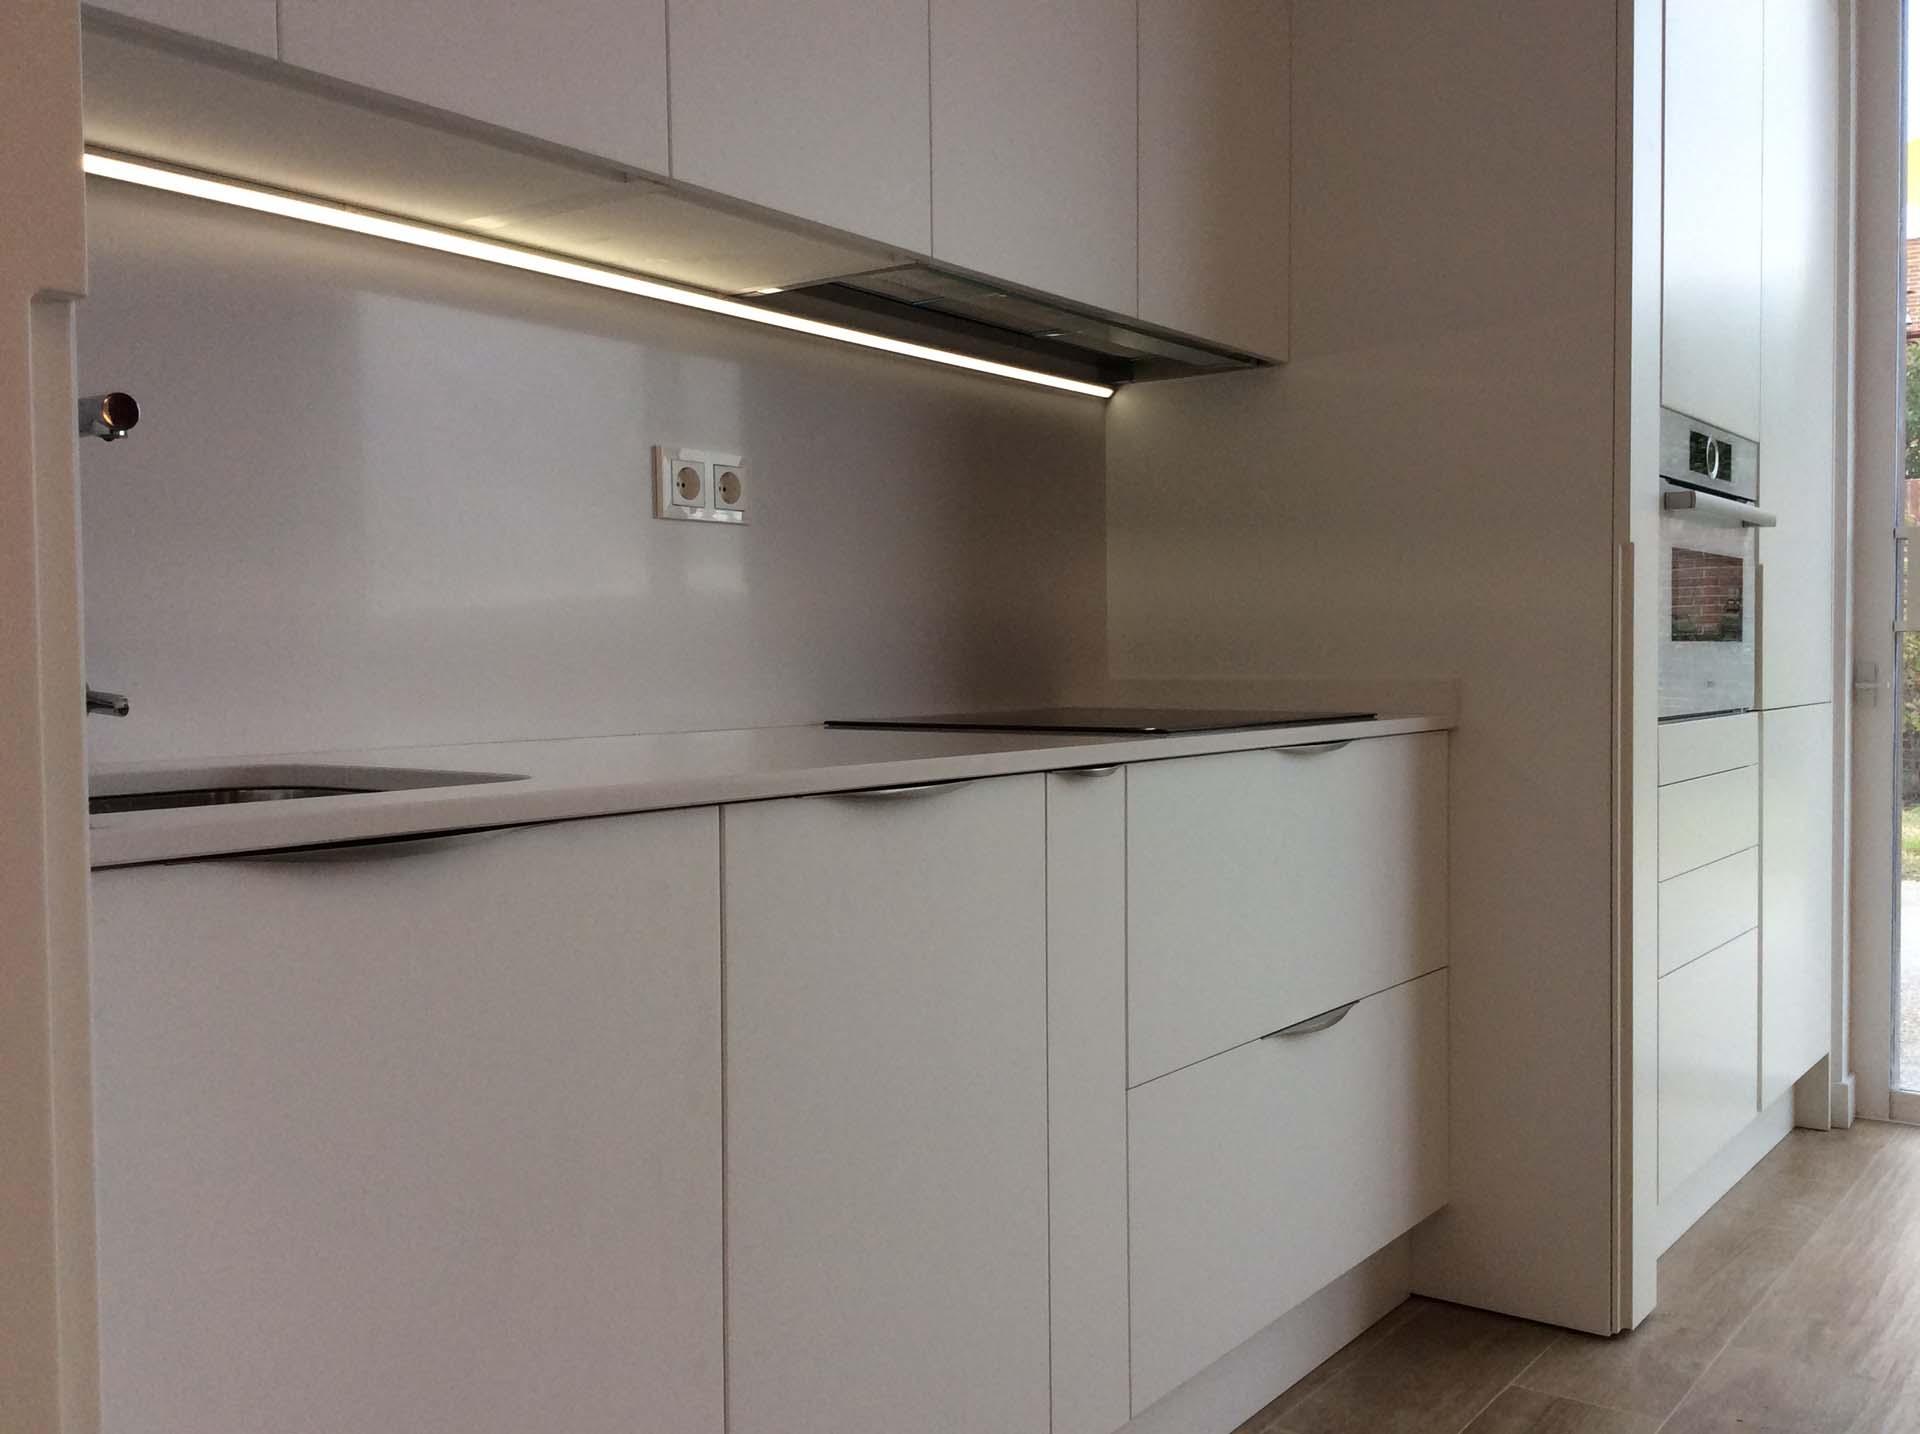 Cocina con puertas de ocultaci n escamoteables abiertas - Tiradores puertas de cocina ...